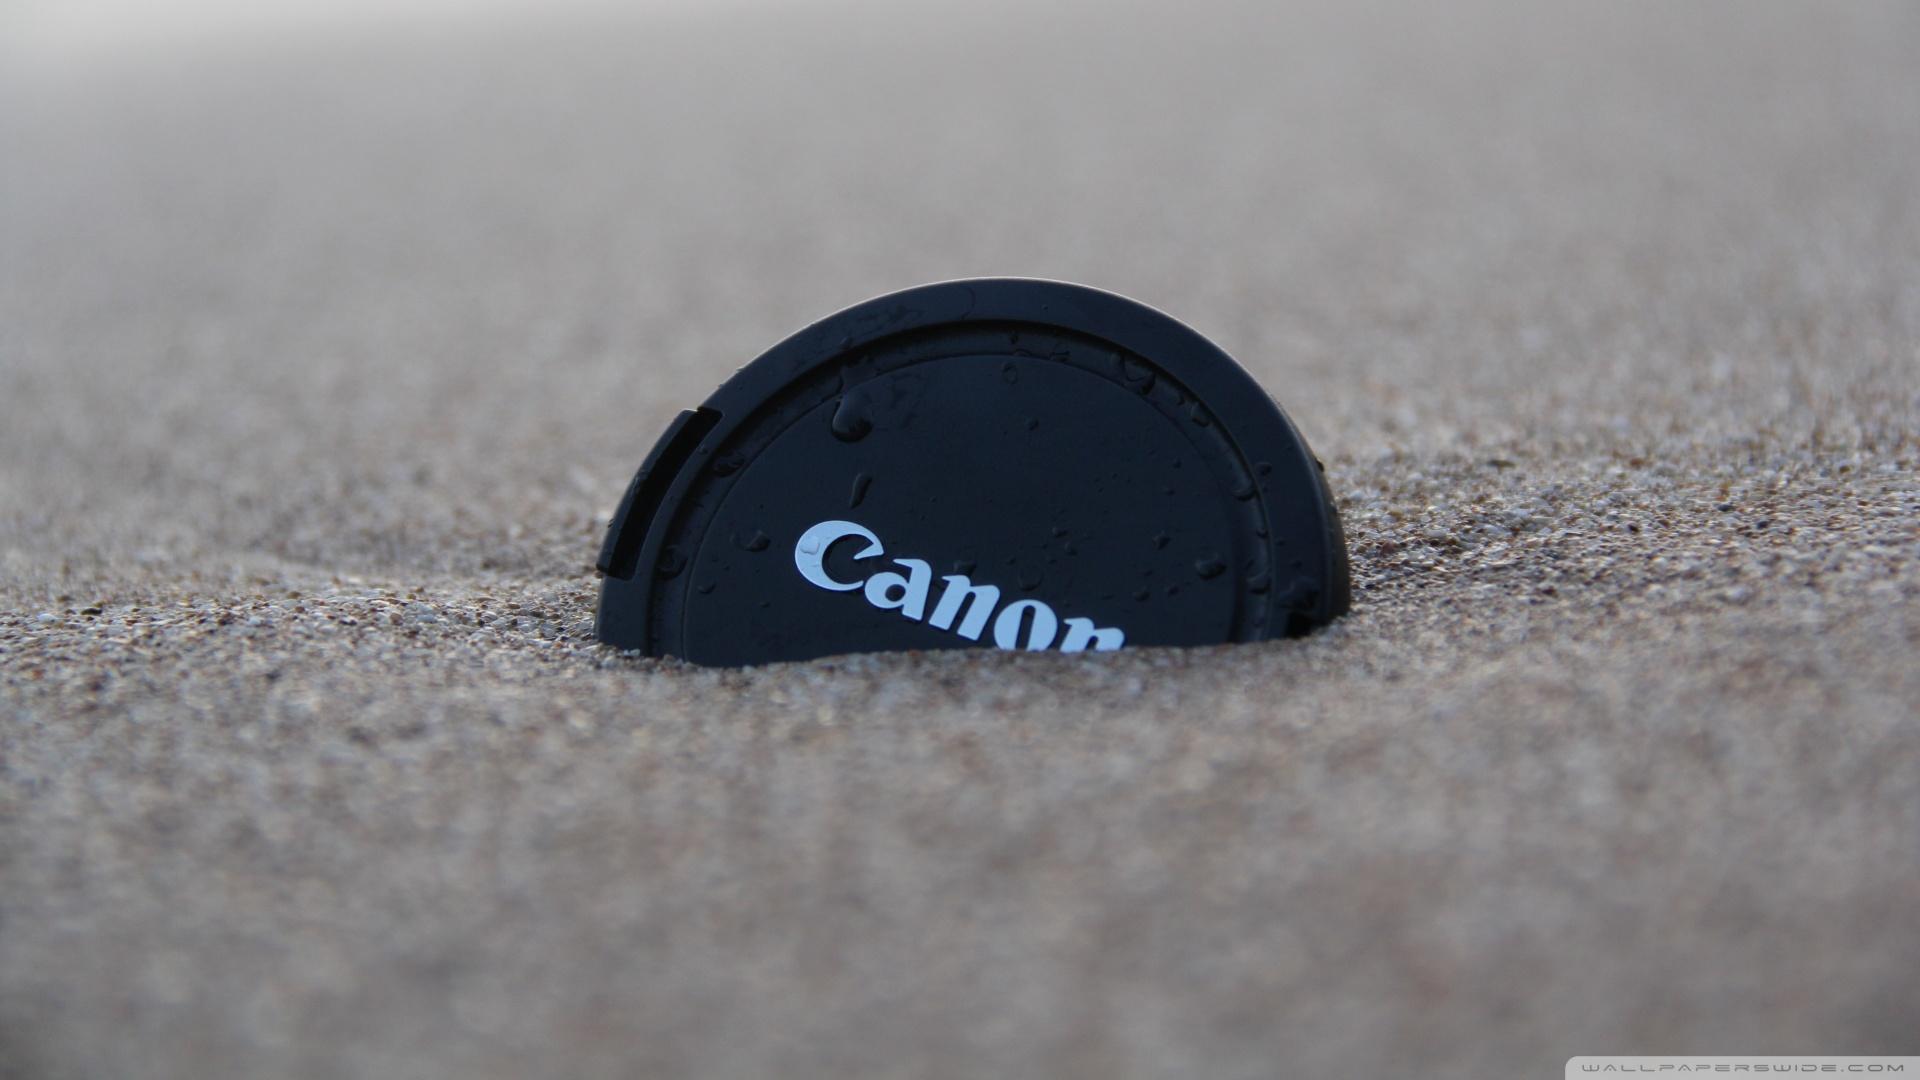 Canon 60d Wallpaper Download canon eos 1920x1080